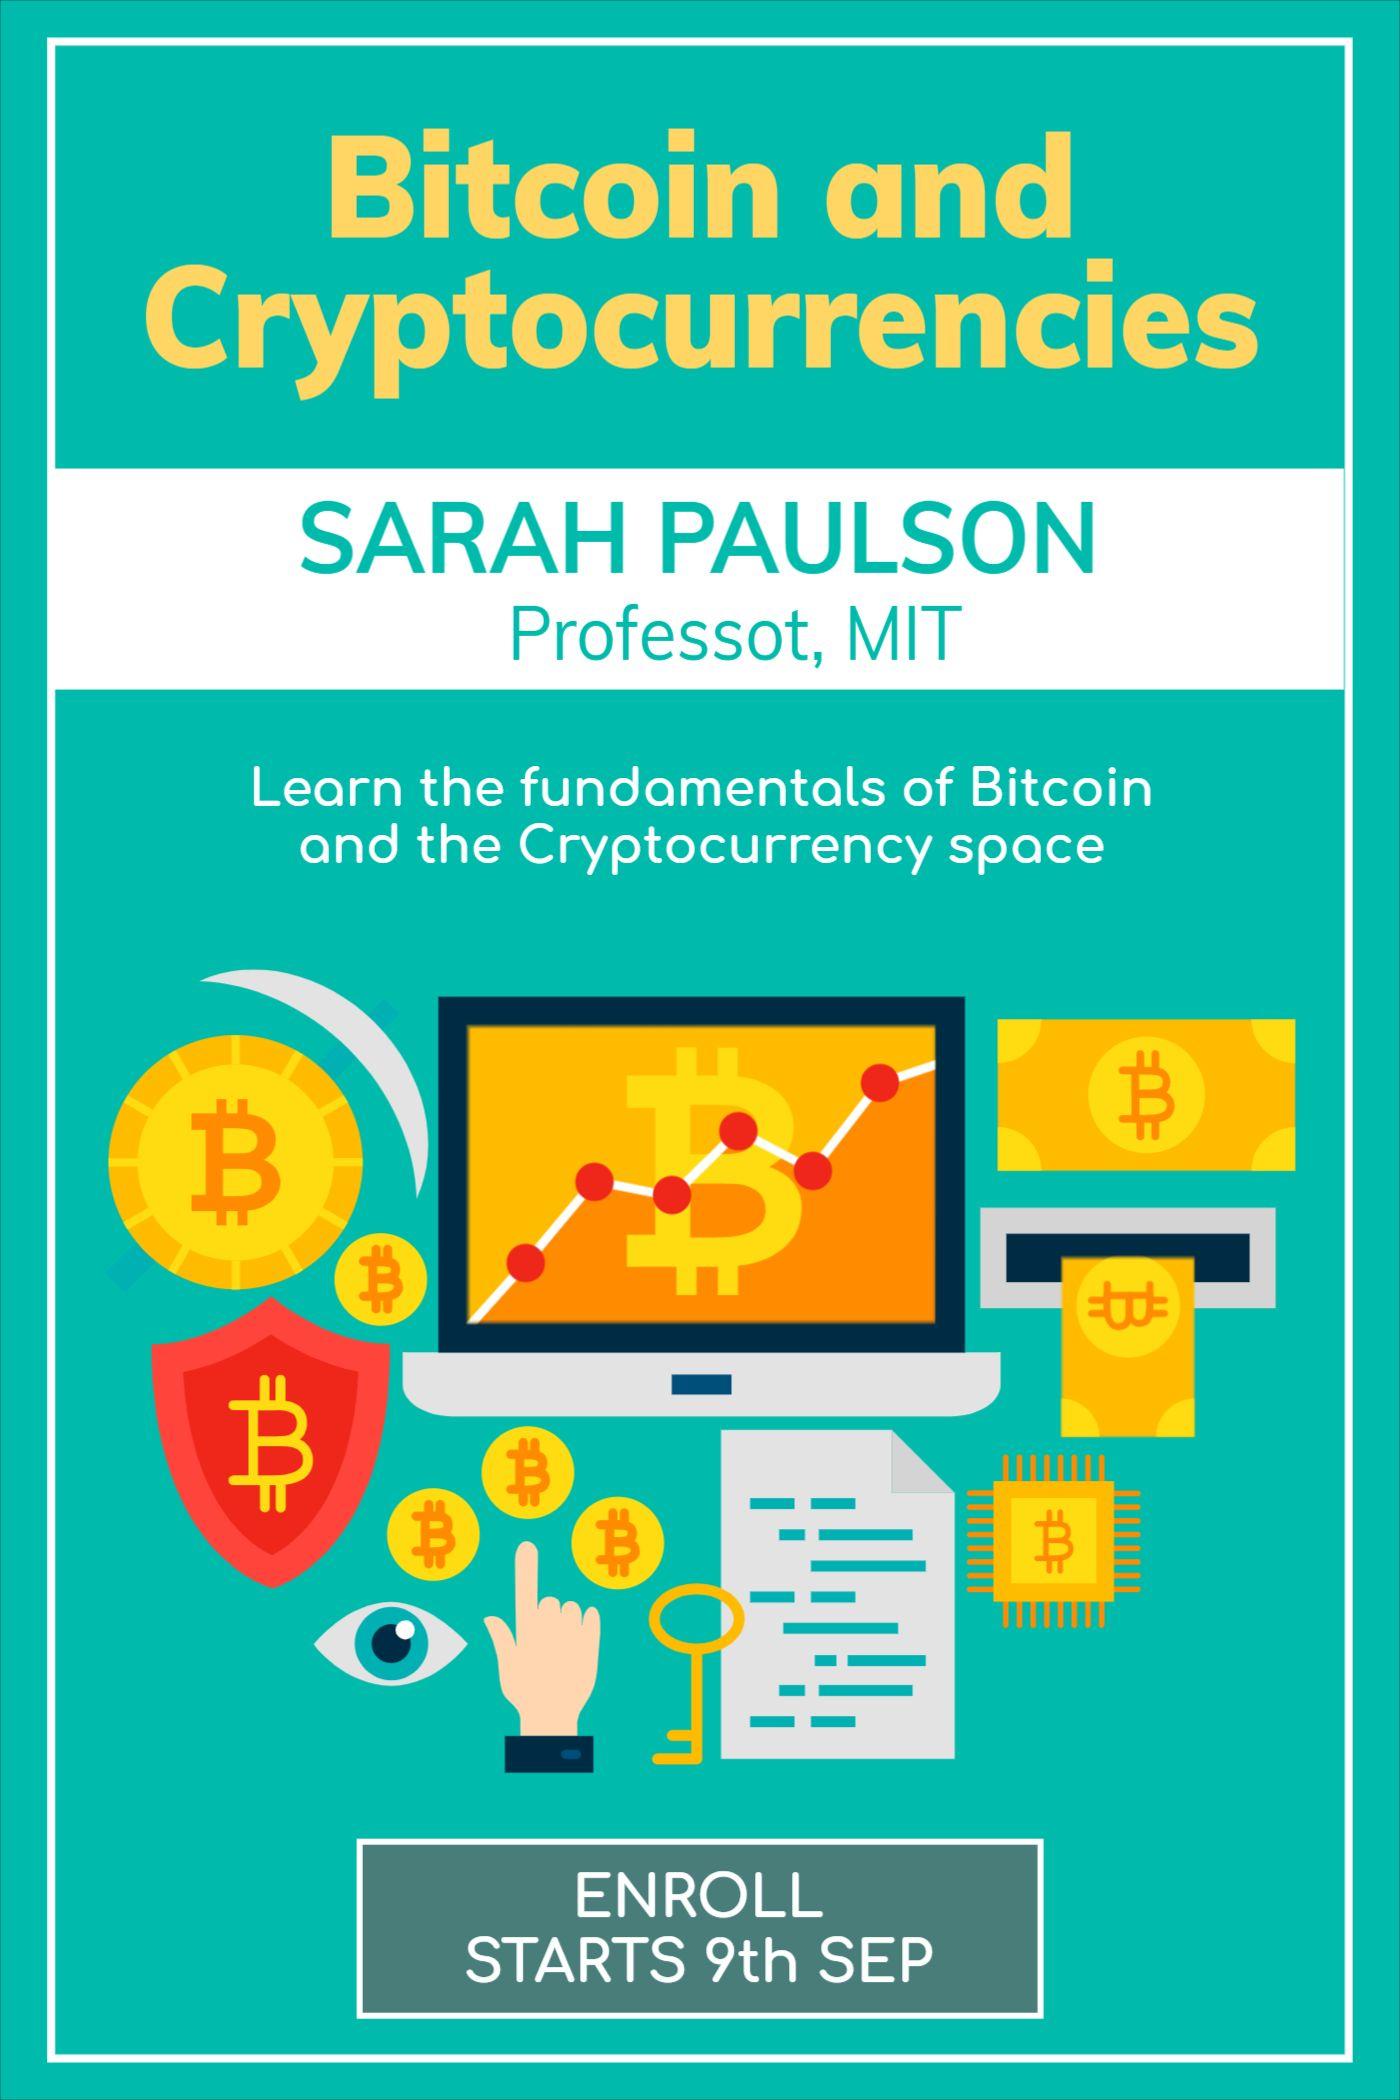 Bitcoin Online Course Template